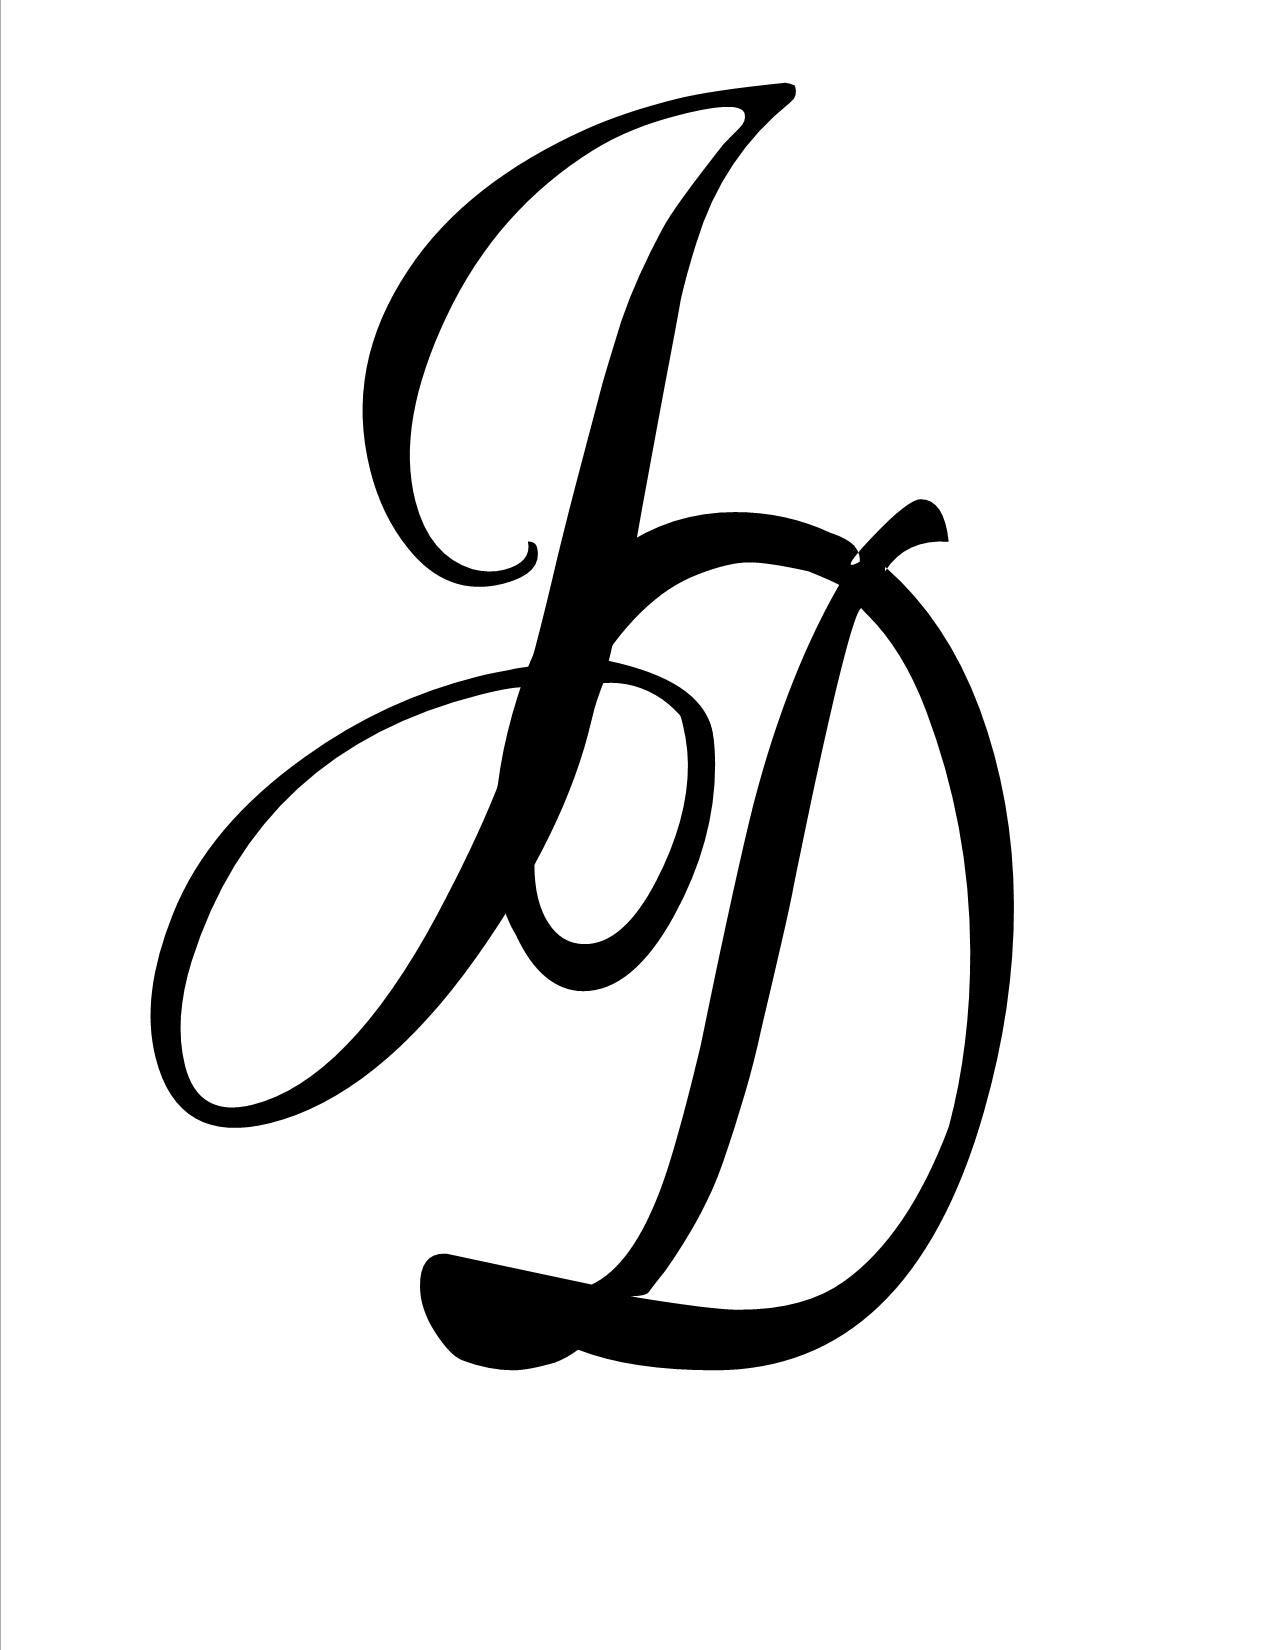 Jd Monogram